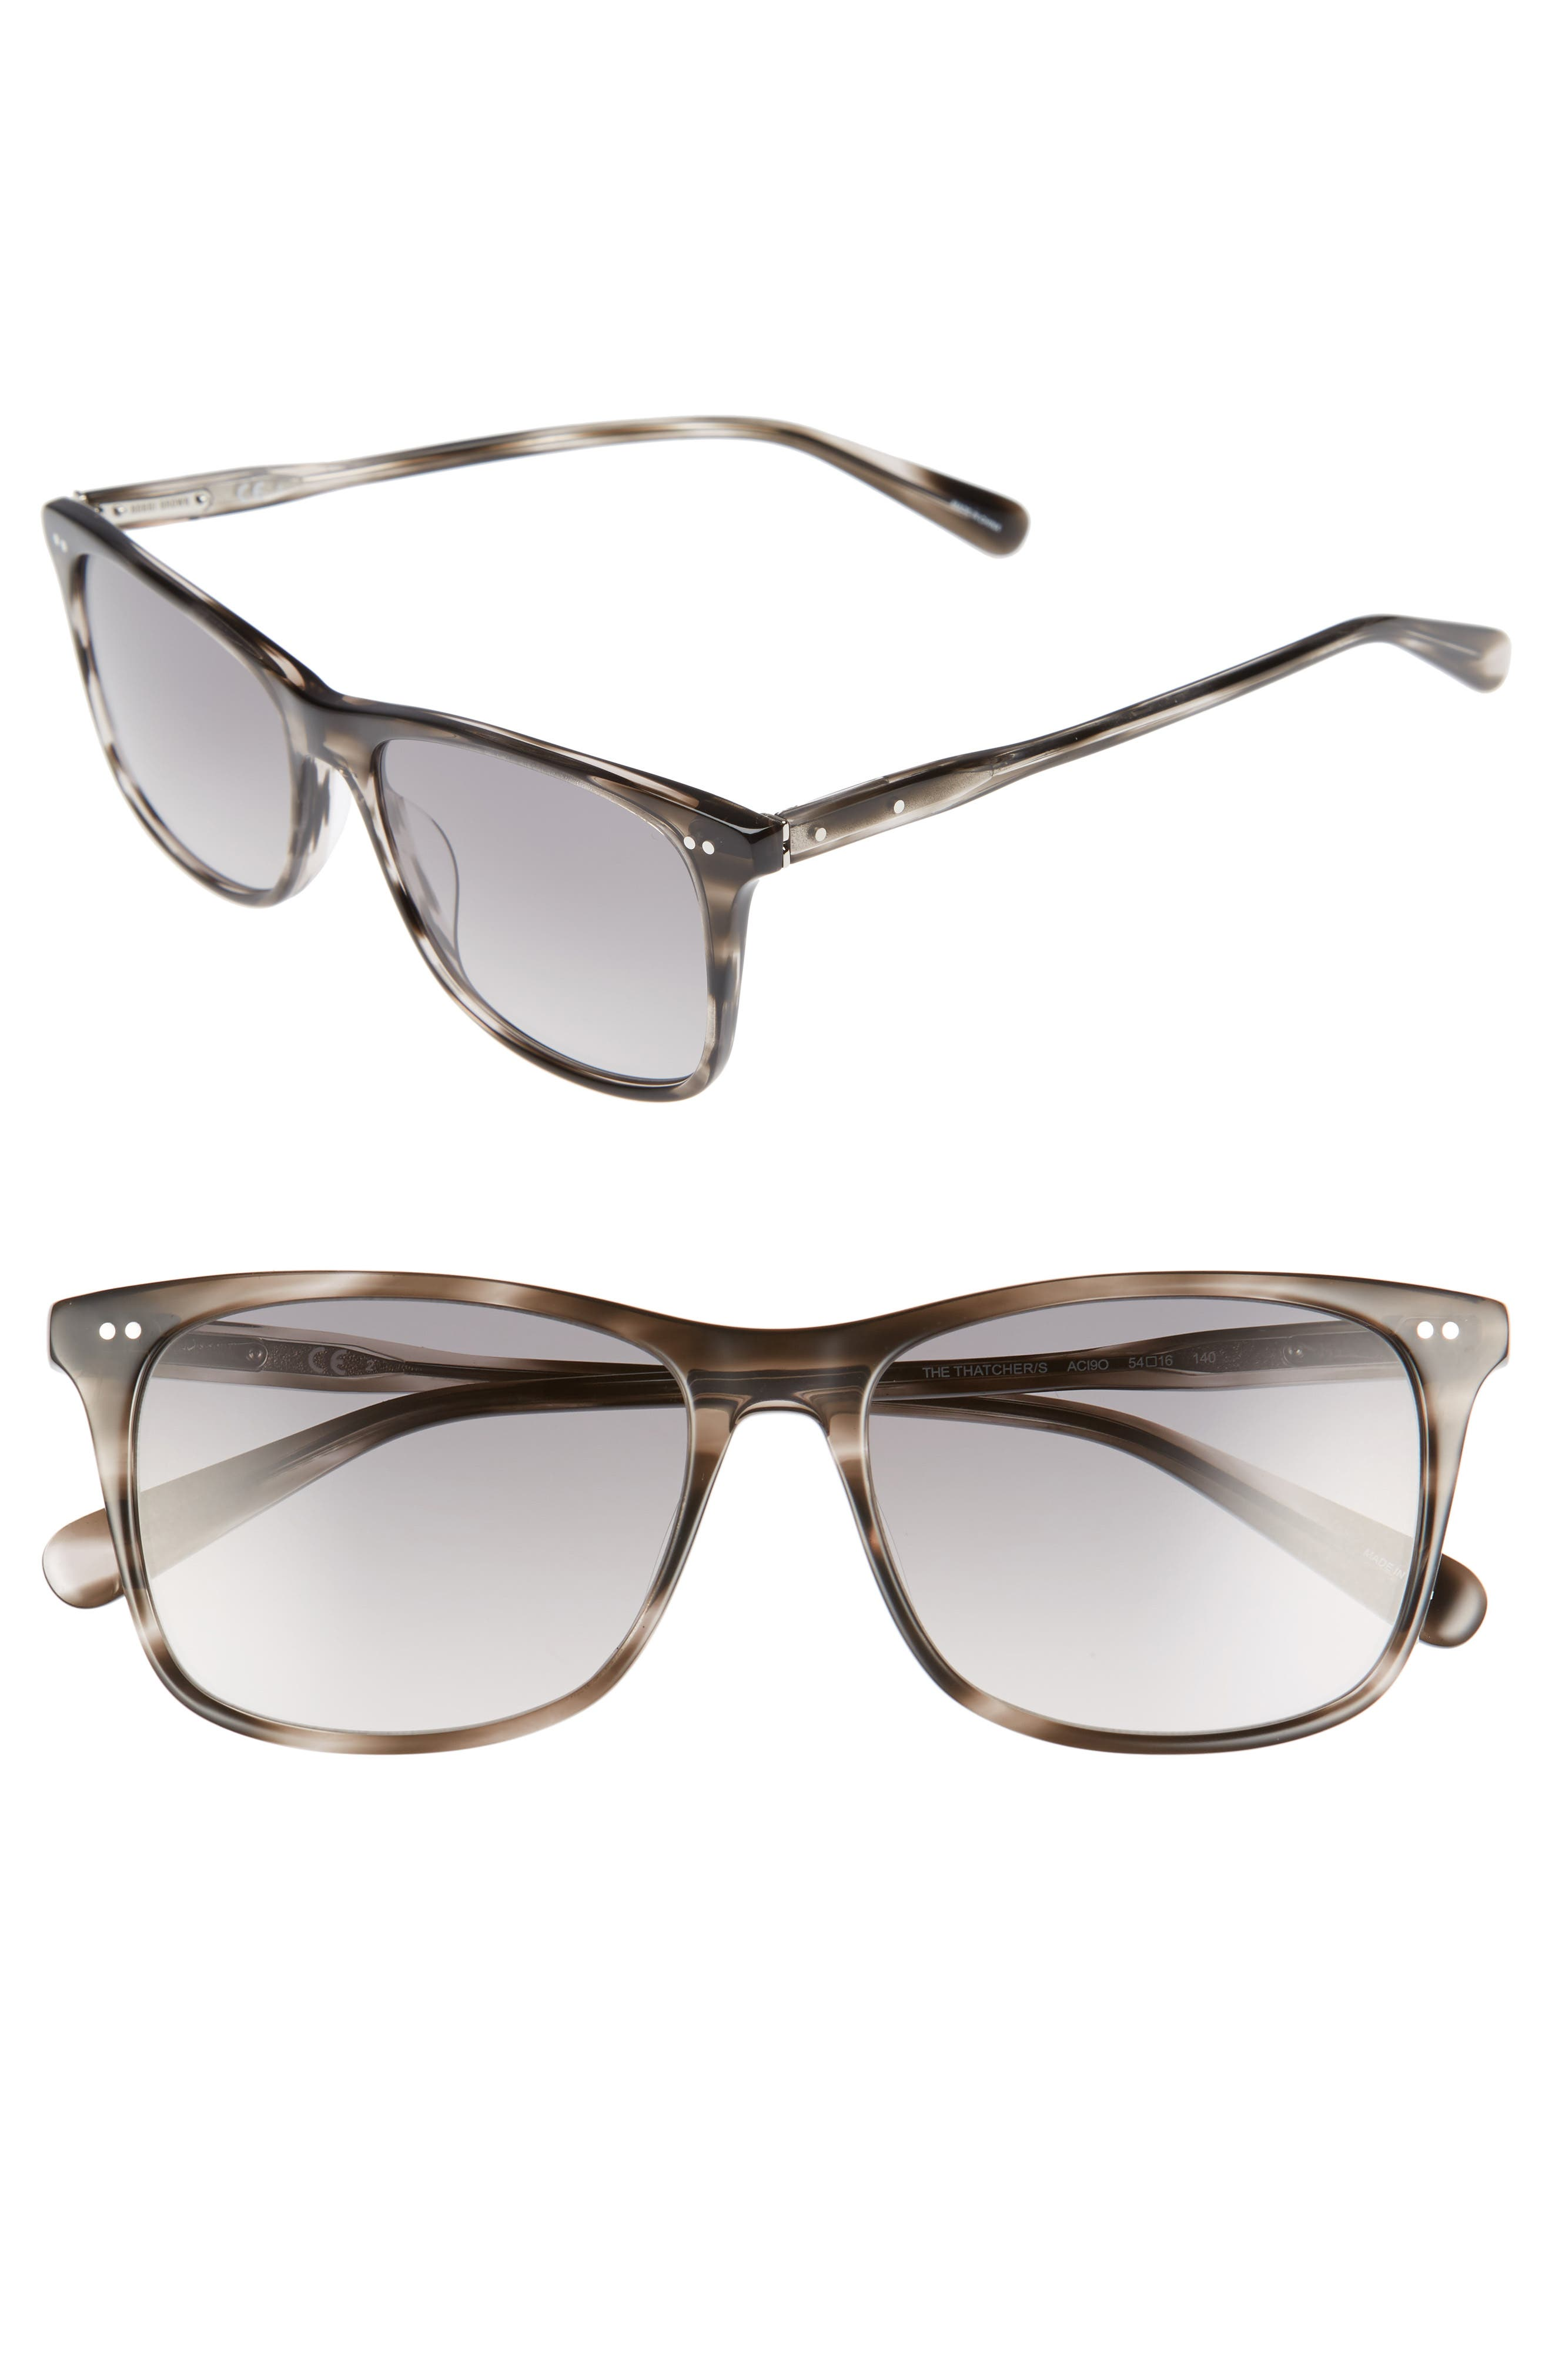 Bobbi Brown The Thatcher 54mm Gradient Sunglasses